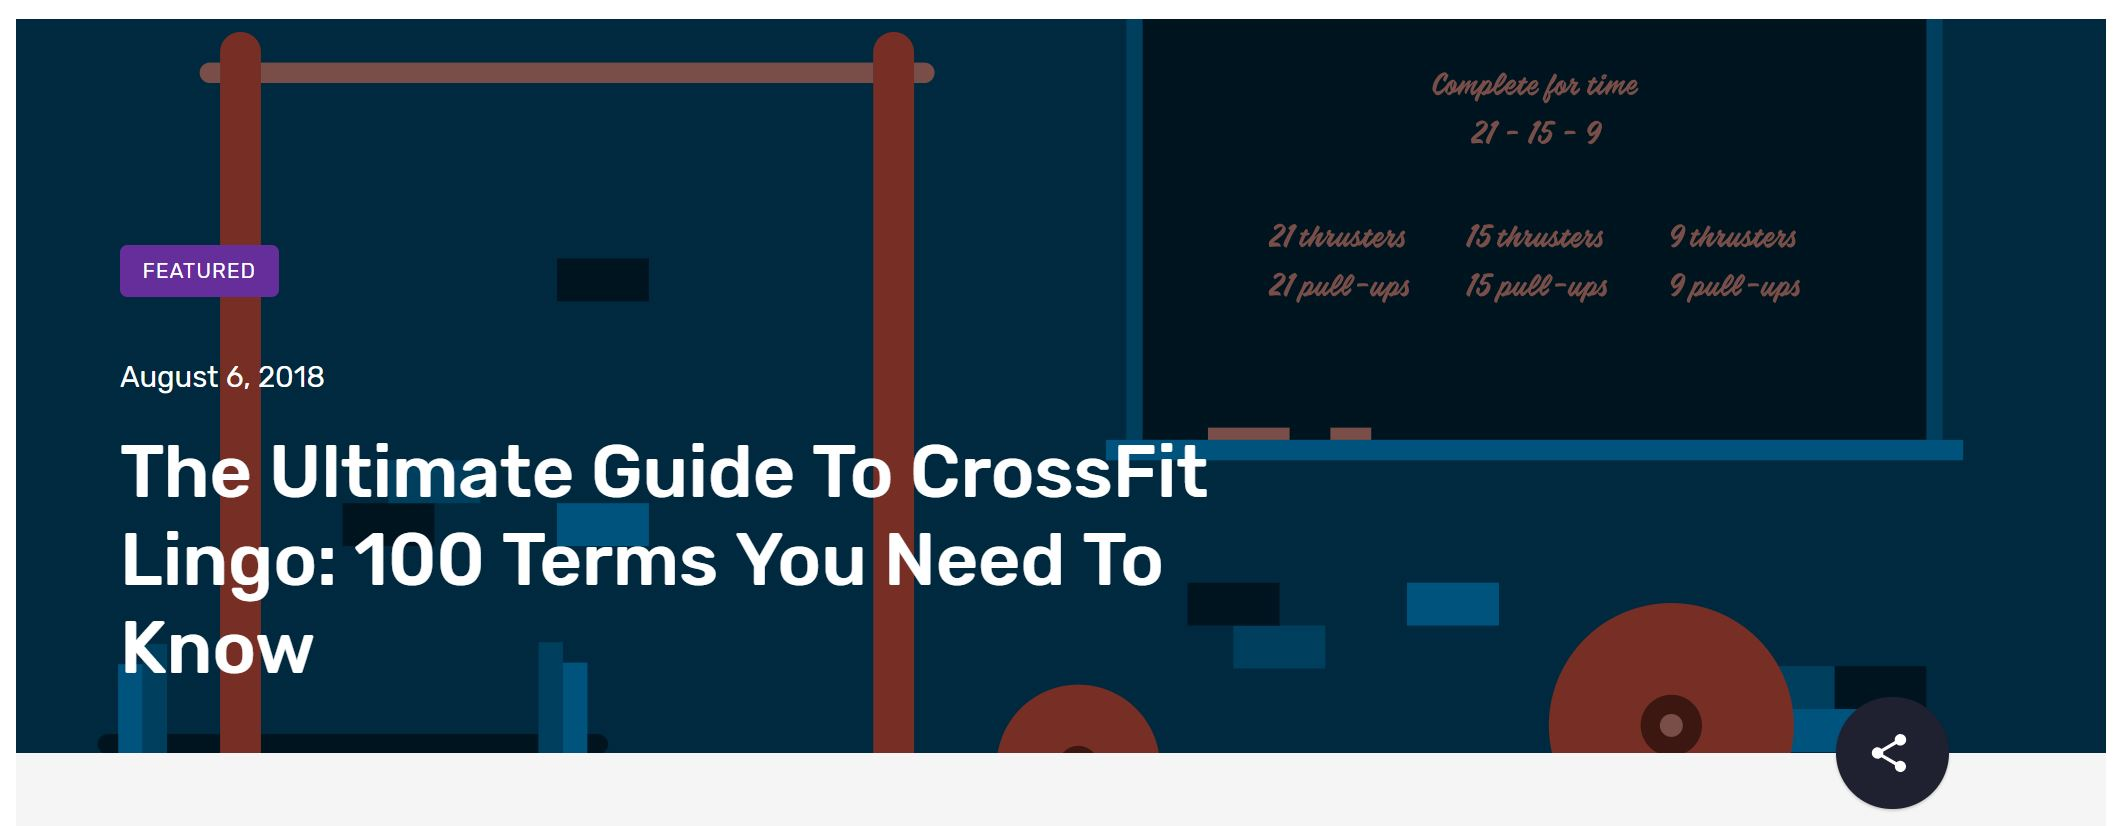 crossfit blog example